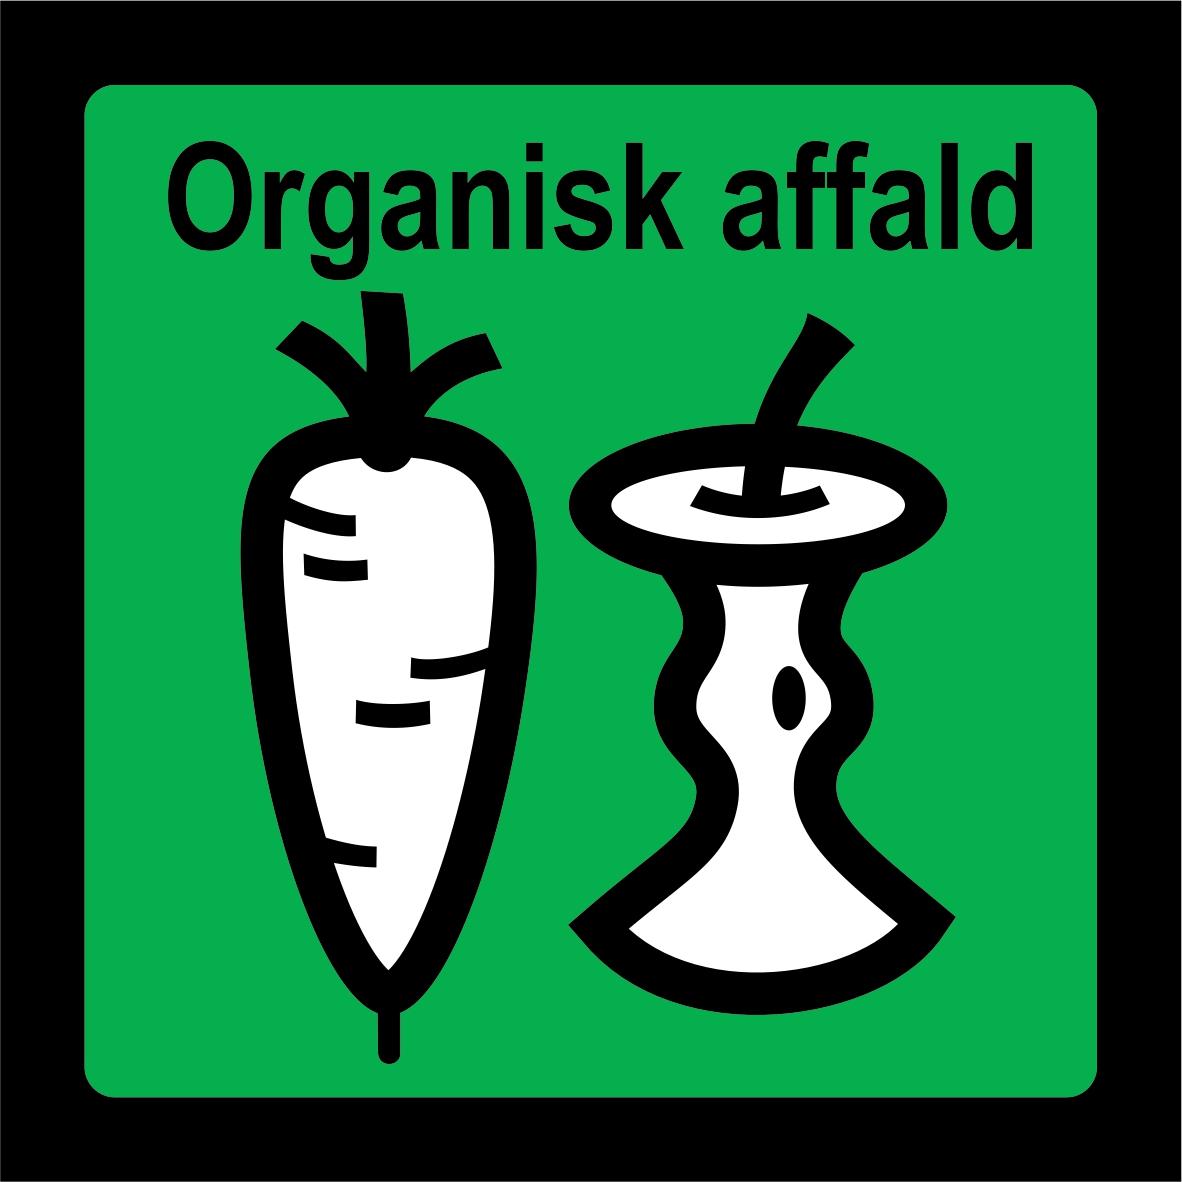 Organisk affald